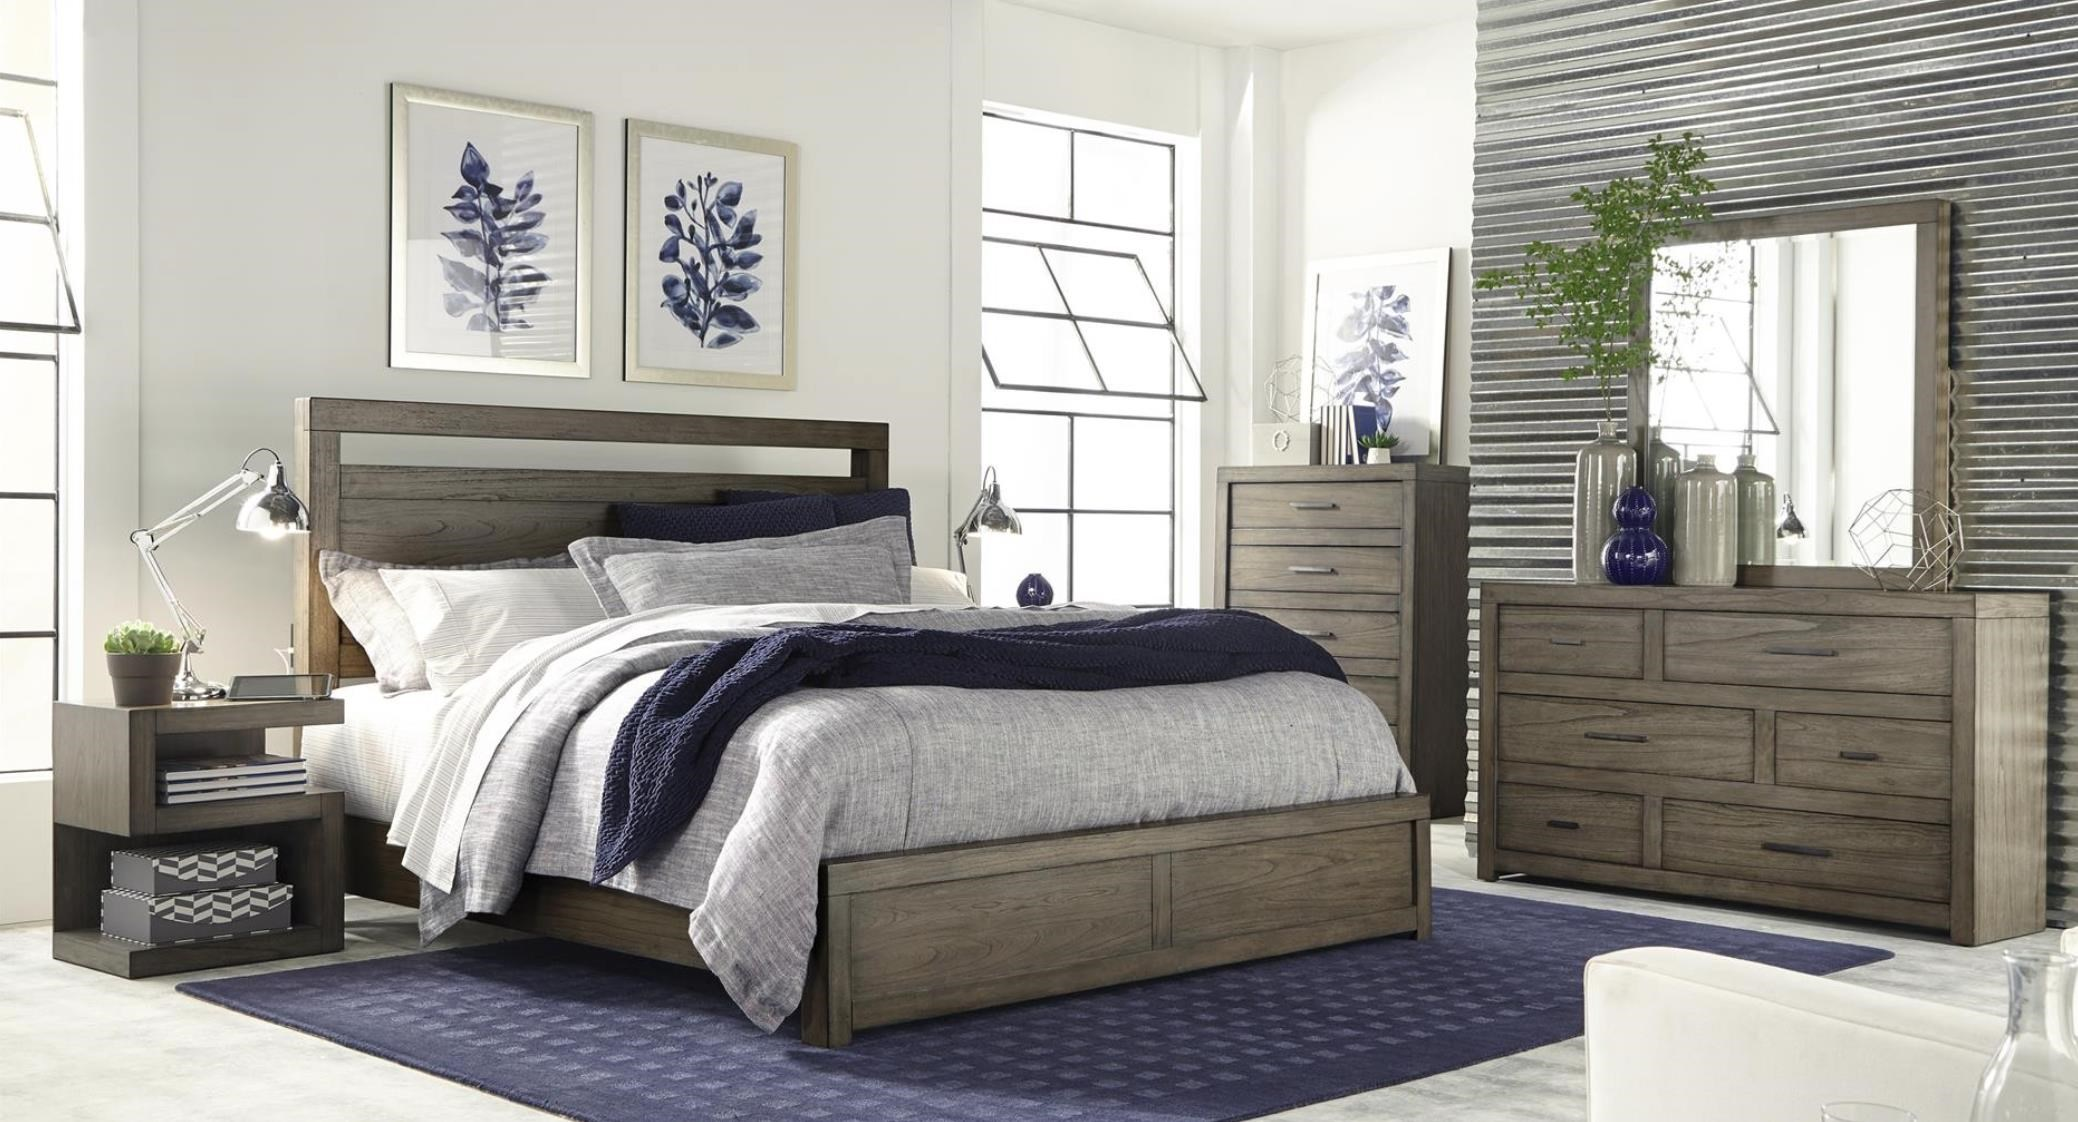 Modern Loft 4-Piece King Bedroom Set by Hills of Aspen at Ruby Gordon Home